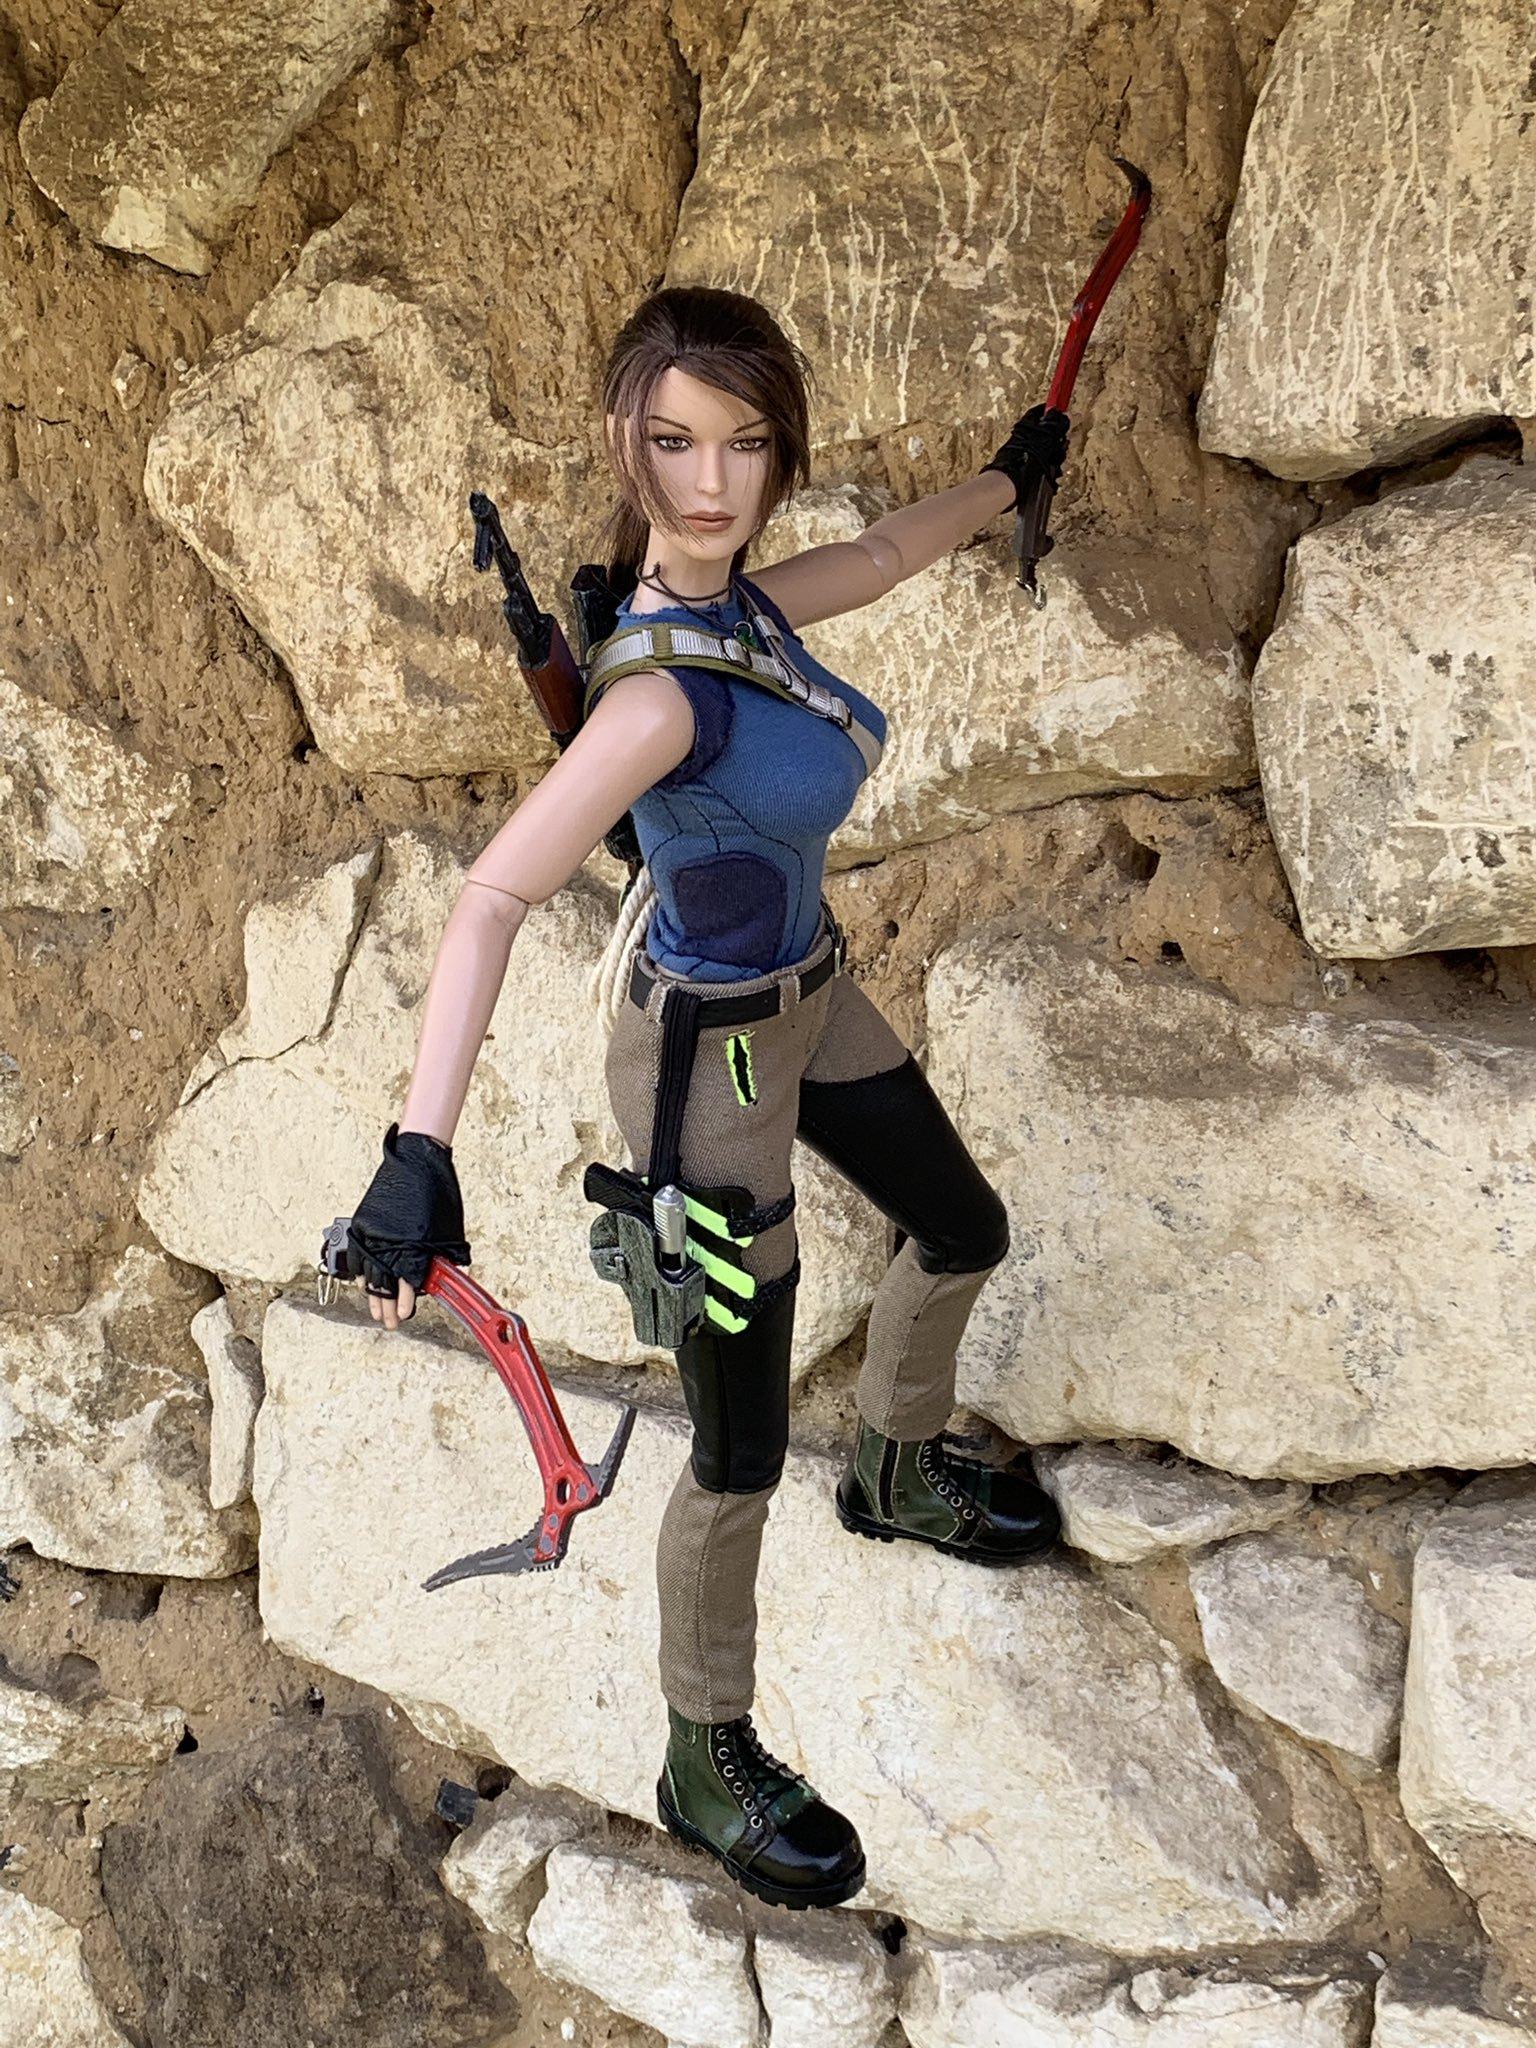 christophe-croft-lara-croft-tonner-doll-13